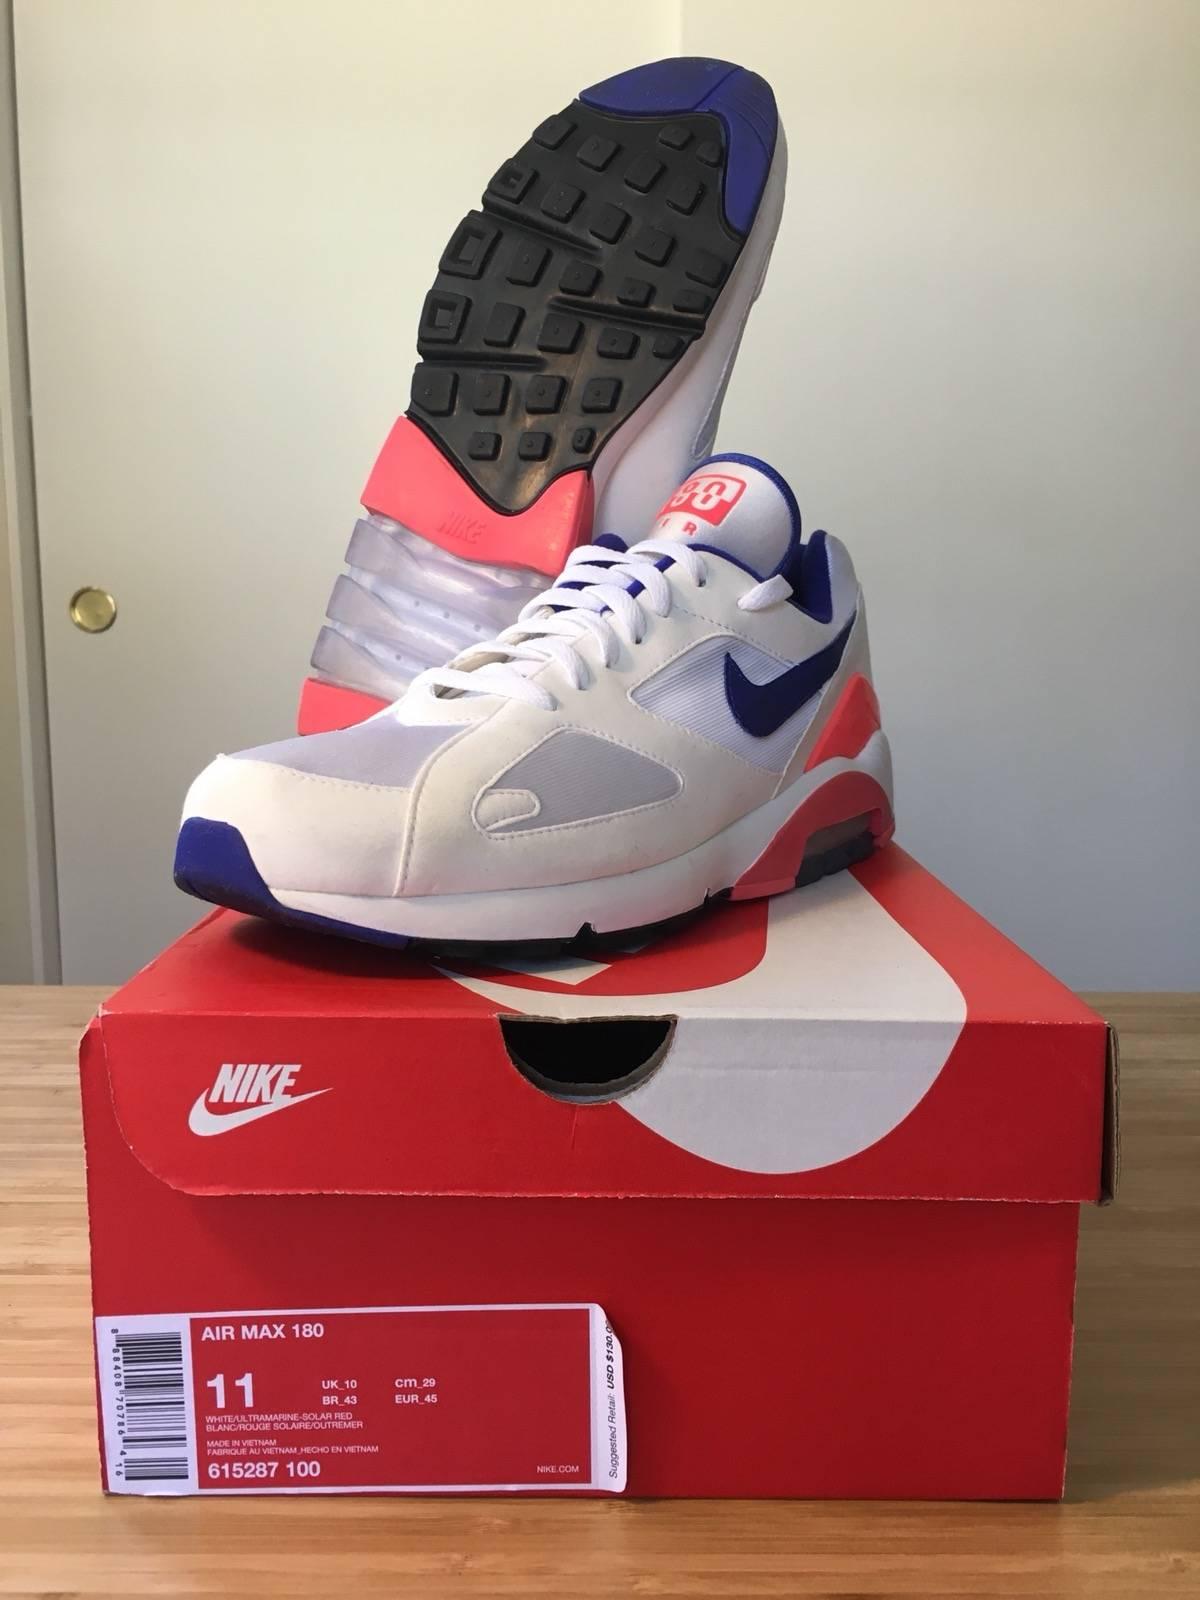 11105 Max 2018 Air Nike Size Ultramarine 2018 180 shQxCtdr